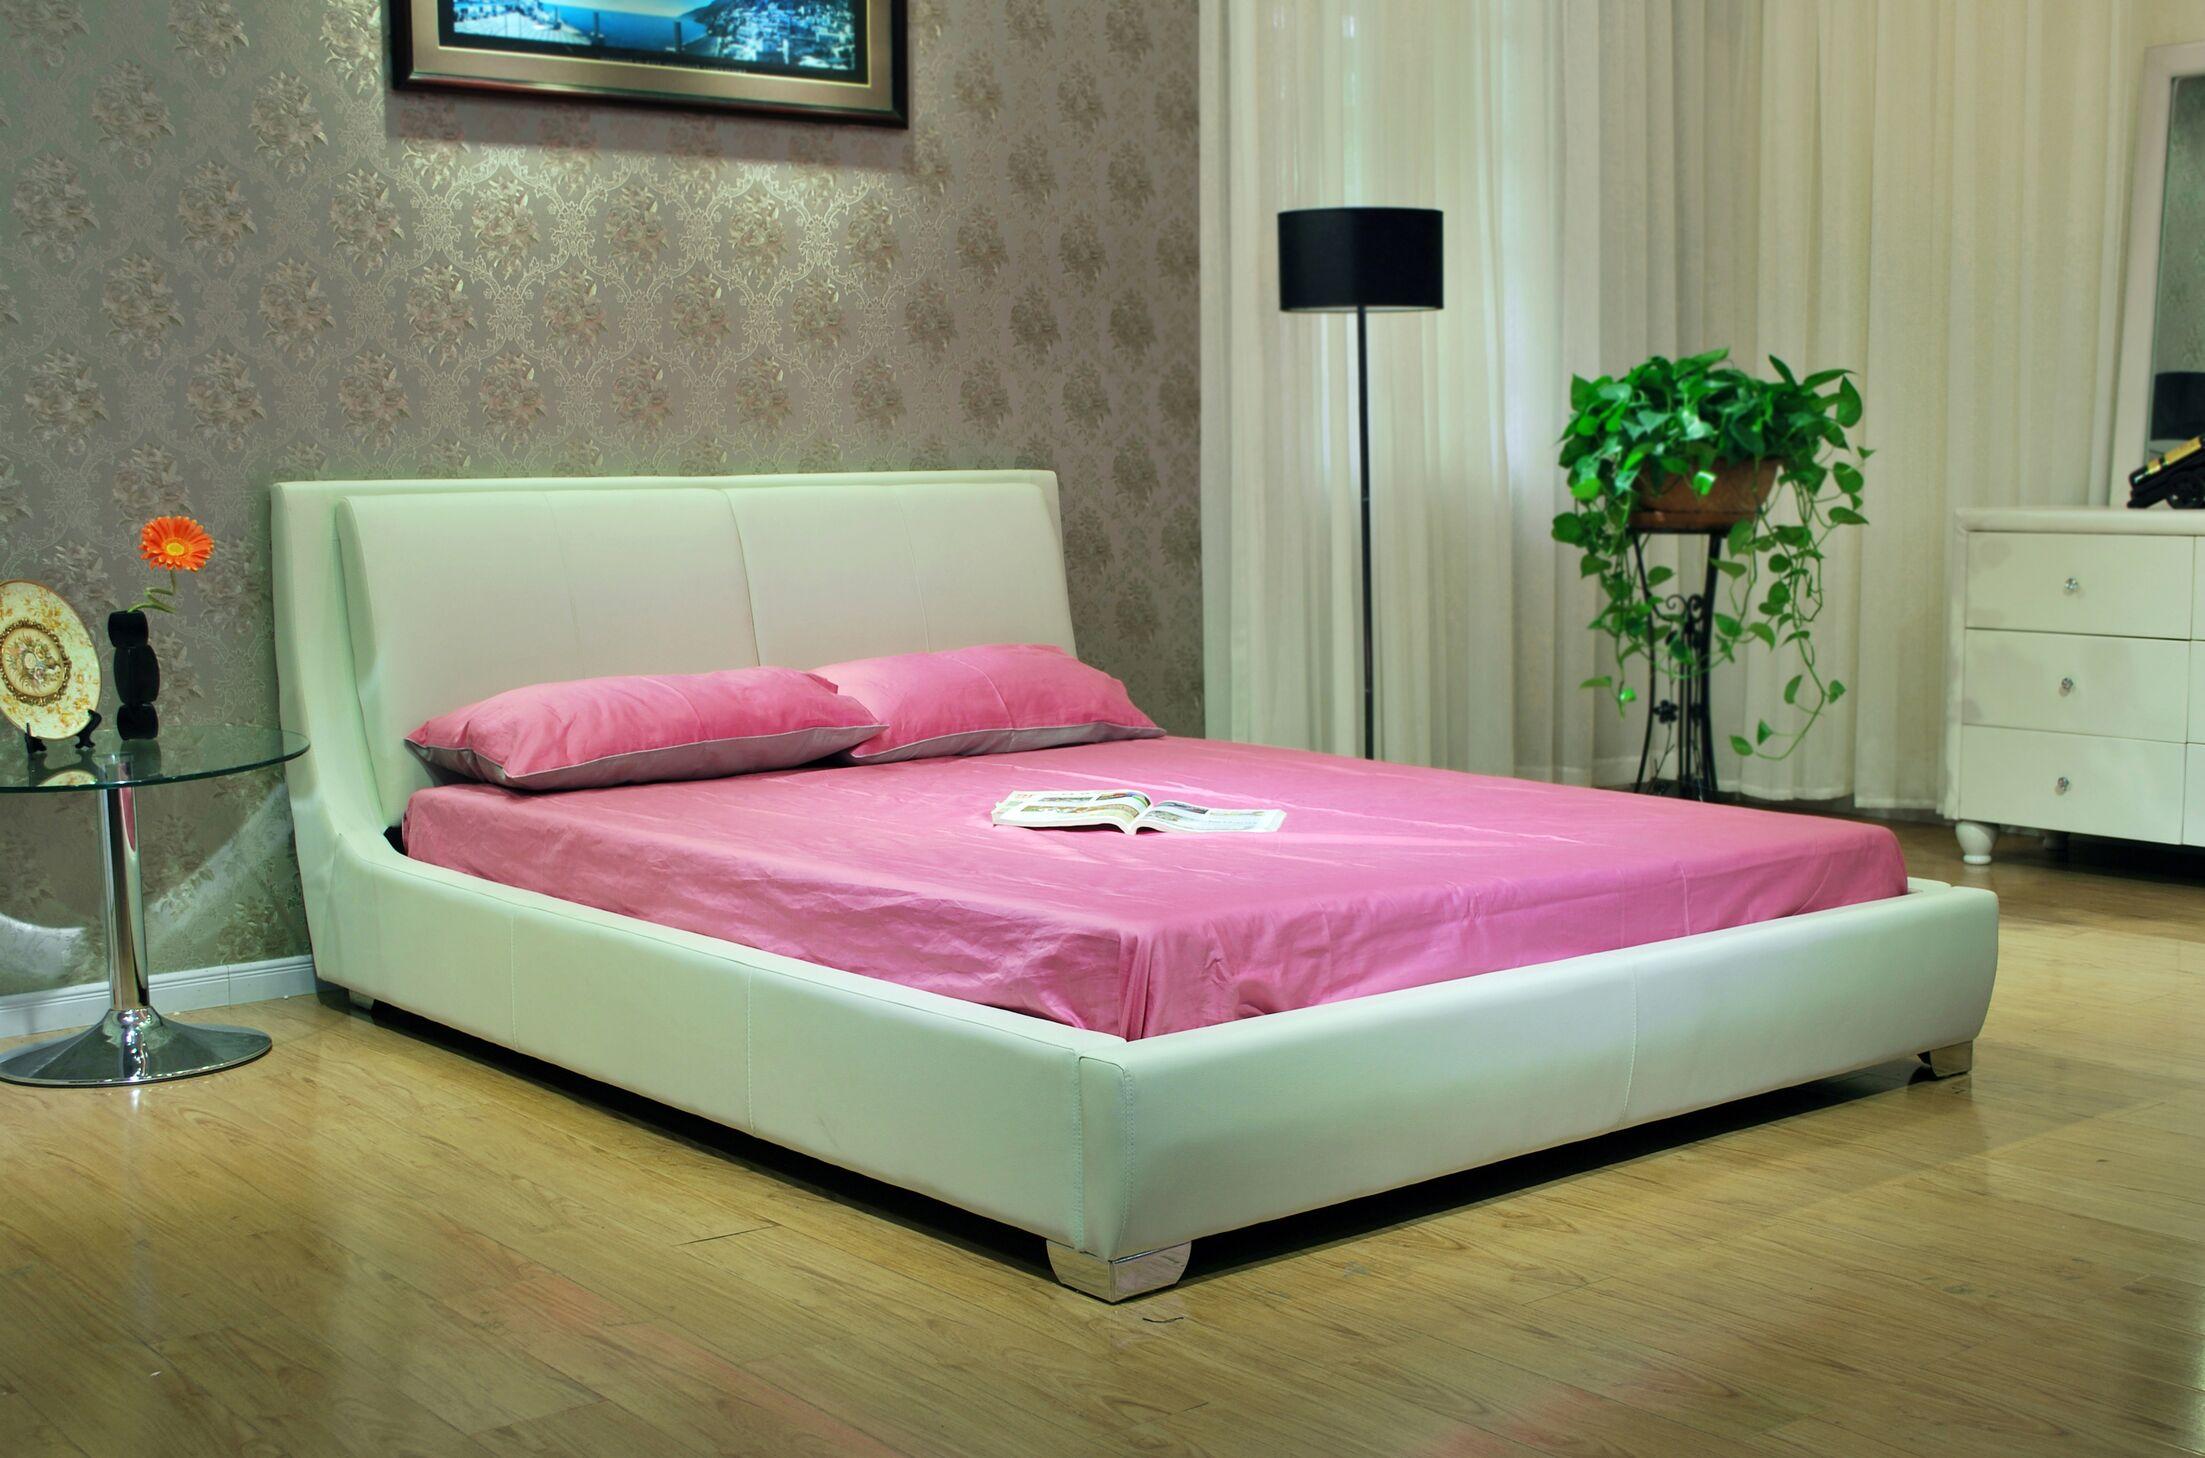 Upholstered Platform Bed Size: California King, Color: White